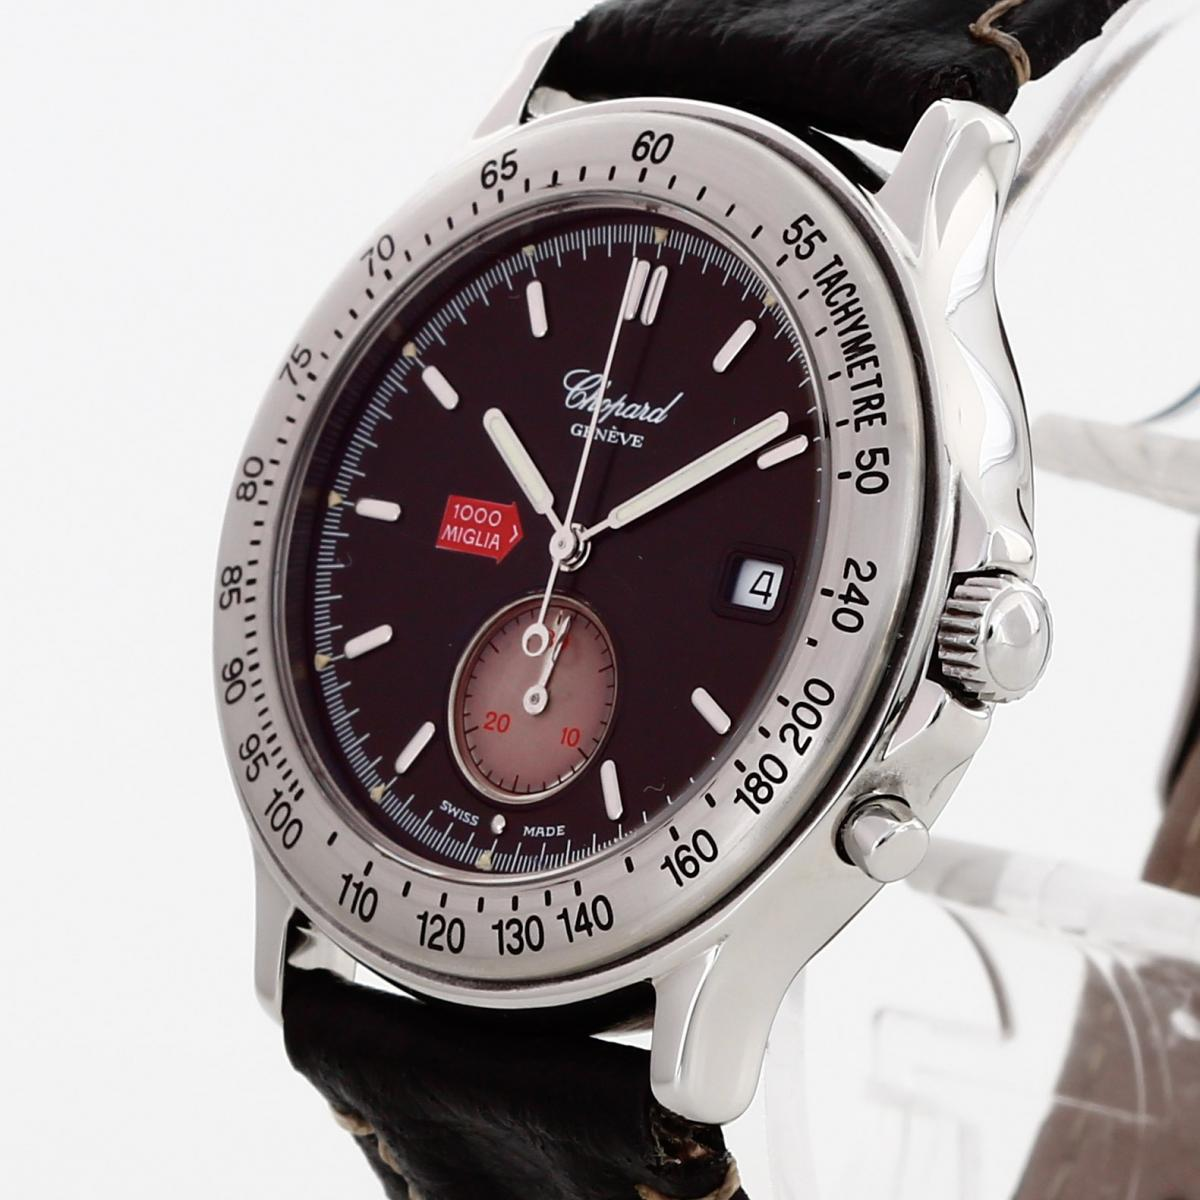 Chopard Mille Miglia Chronograph Edelstahl Ref. 8182